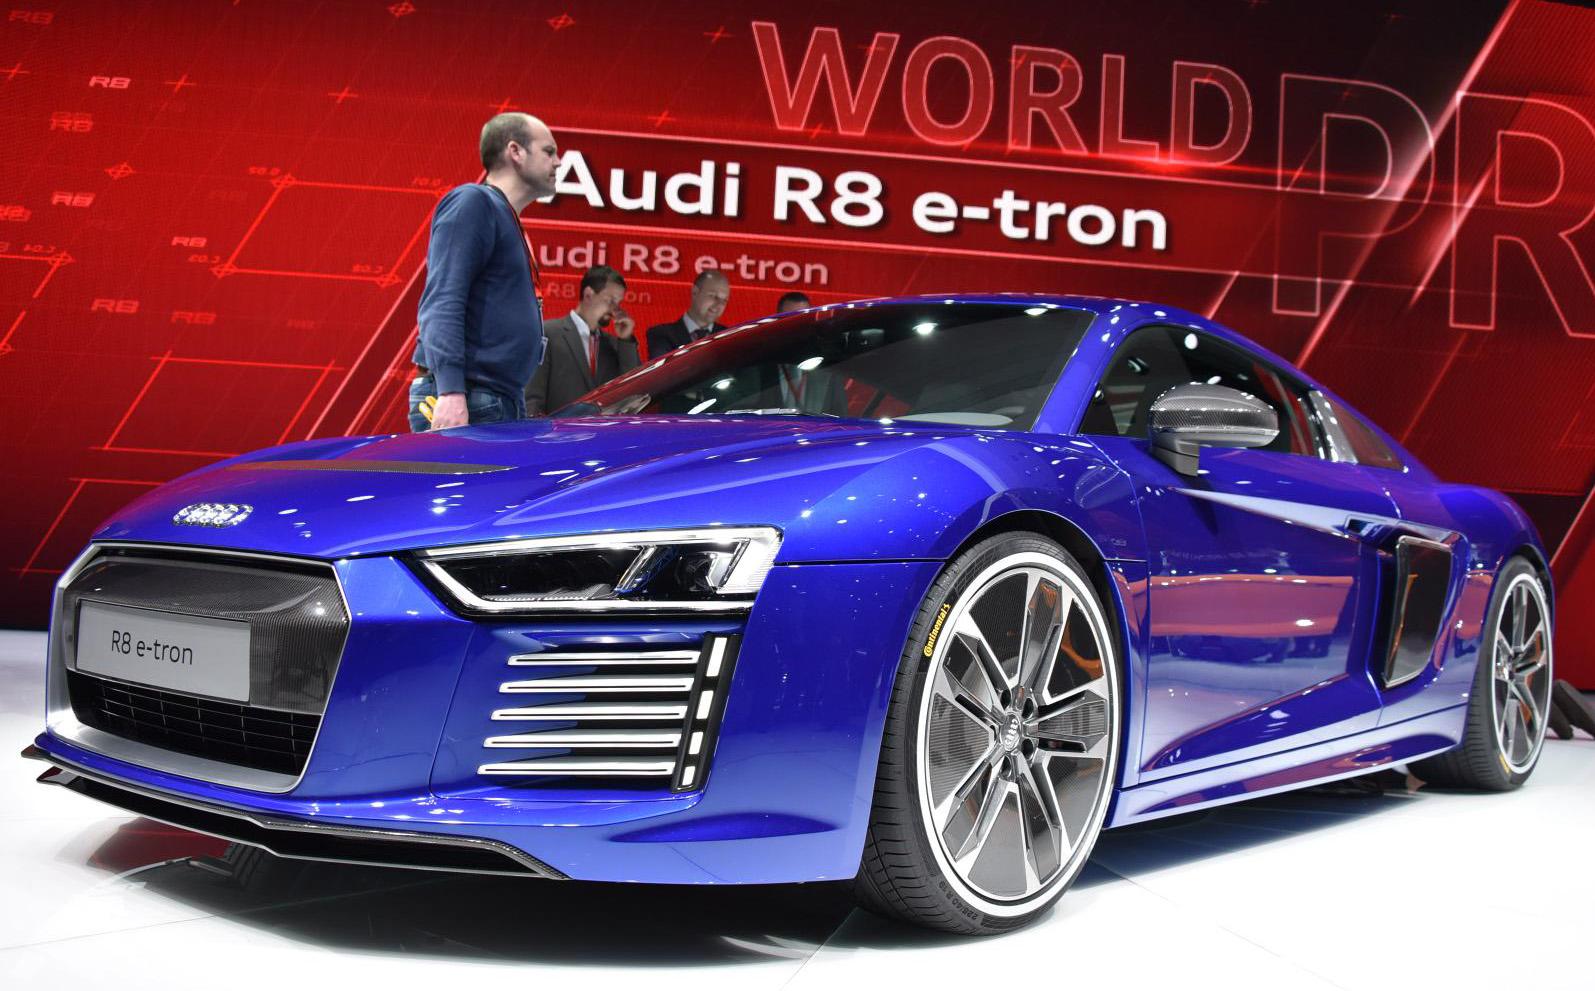 Gallery 2016 Audi R8 5 2 Fsi V10 And R8 E Tron Image 316305